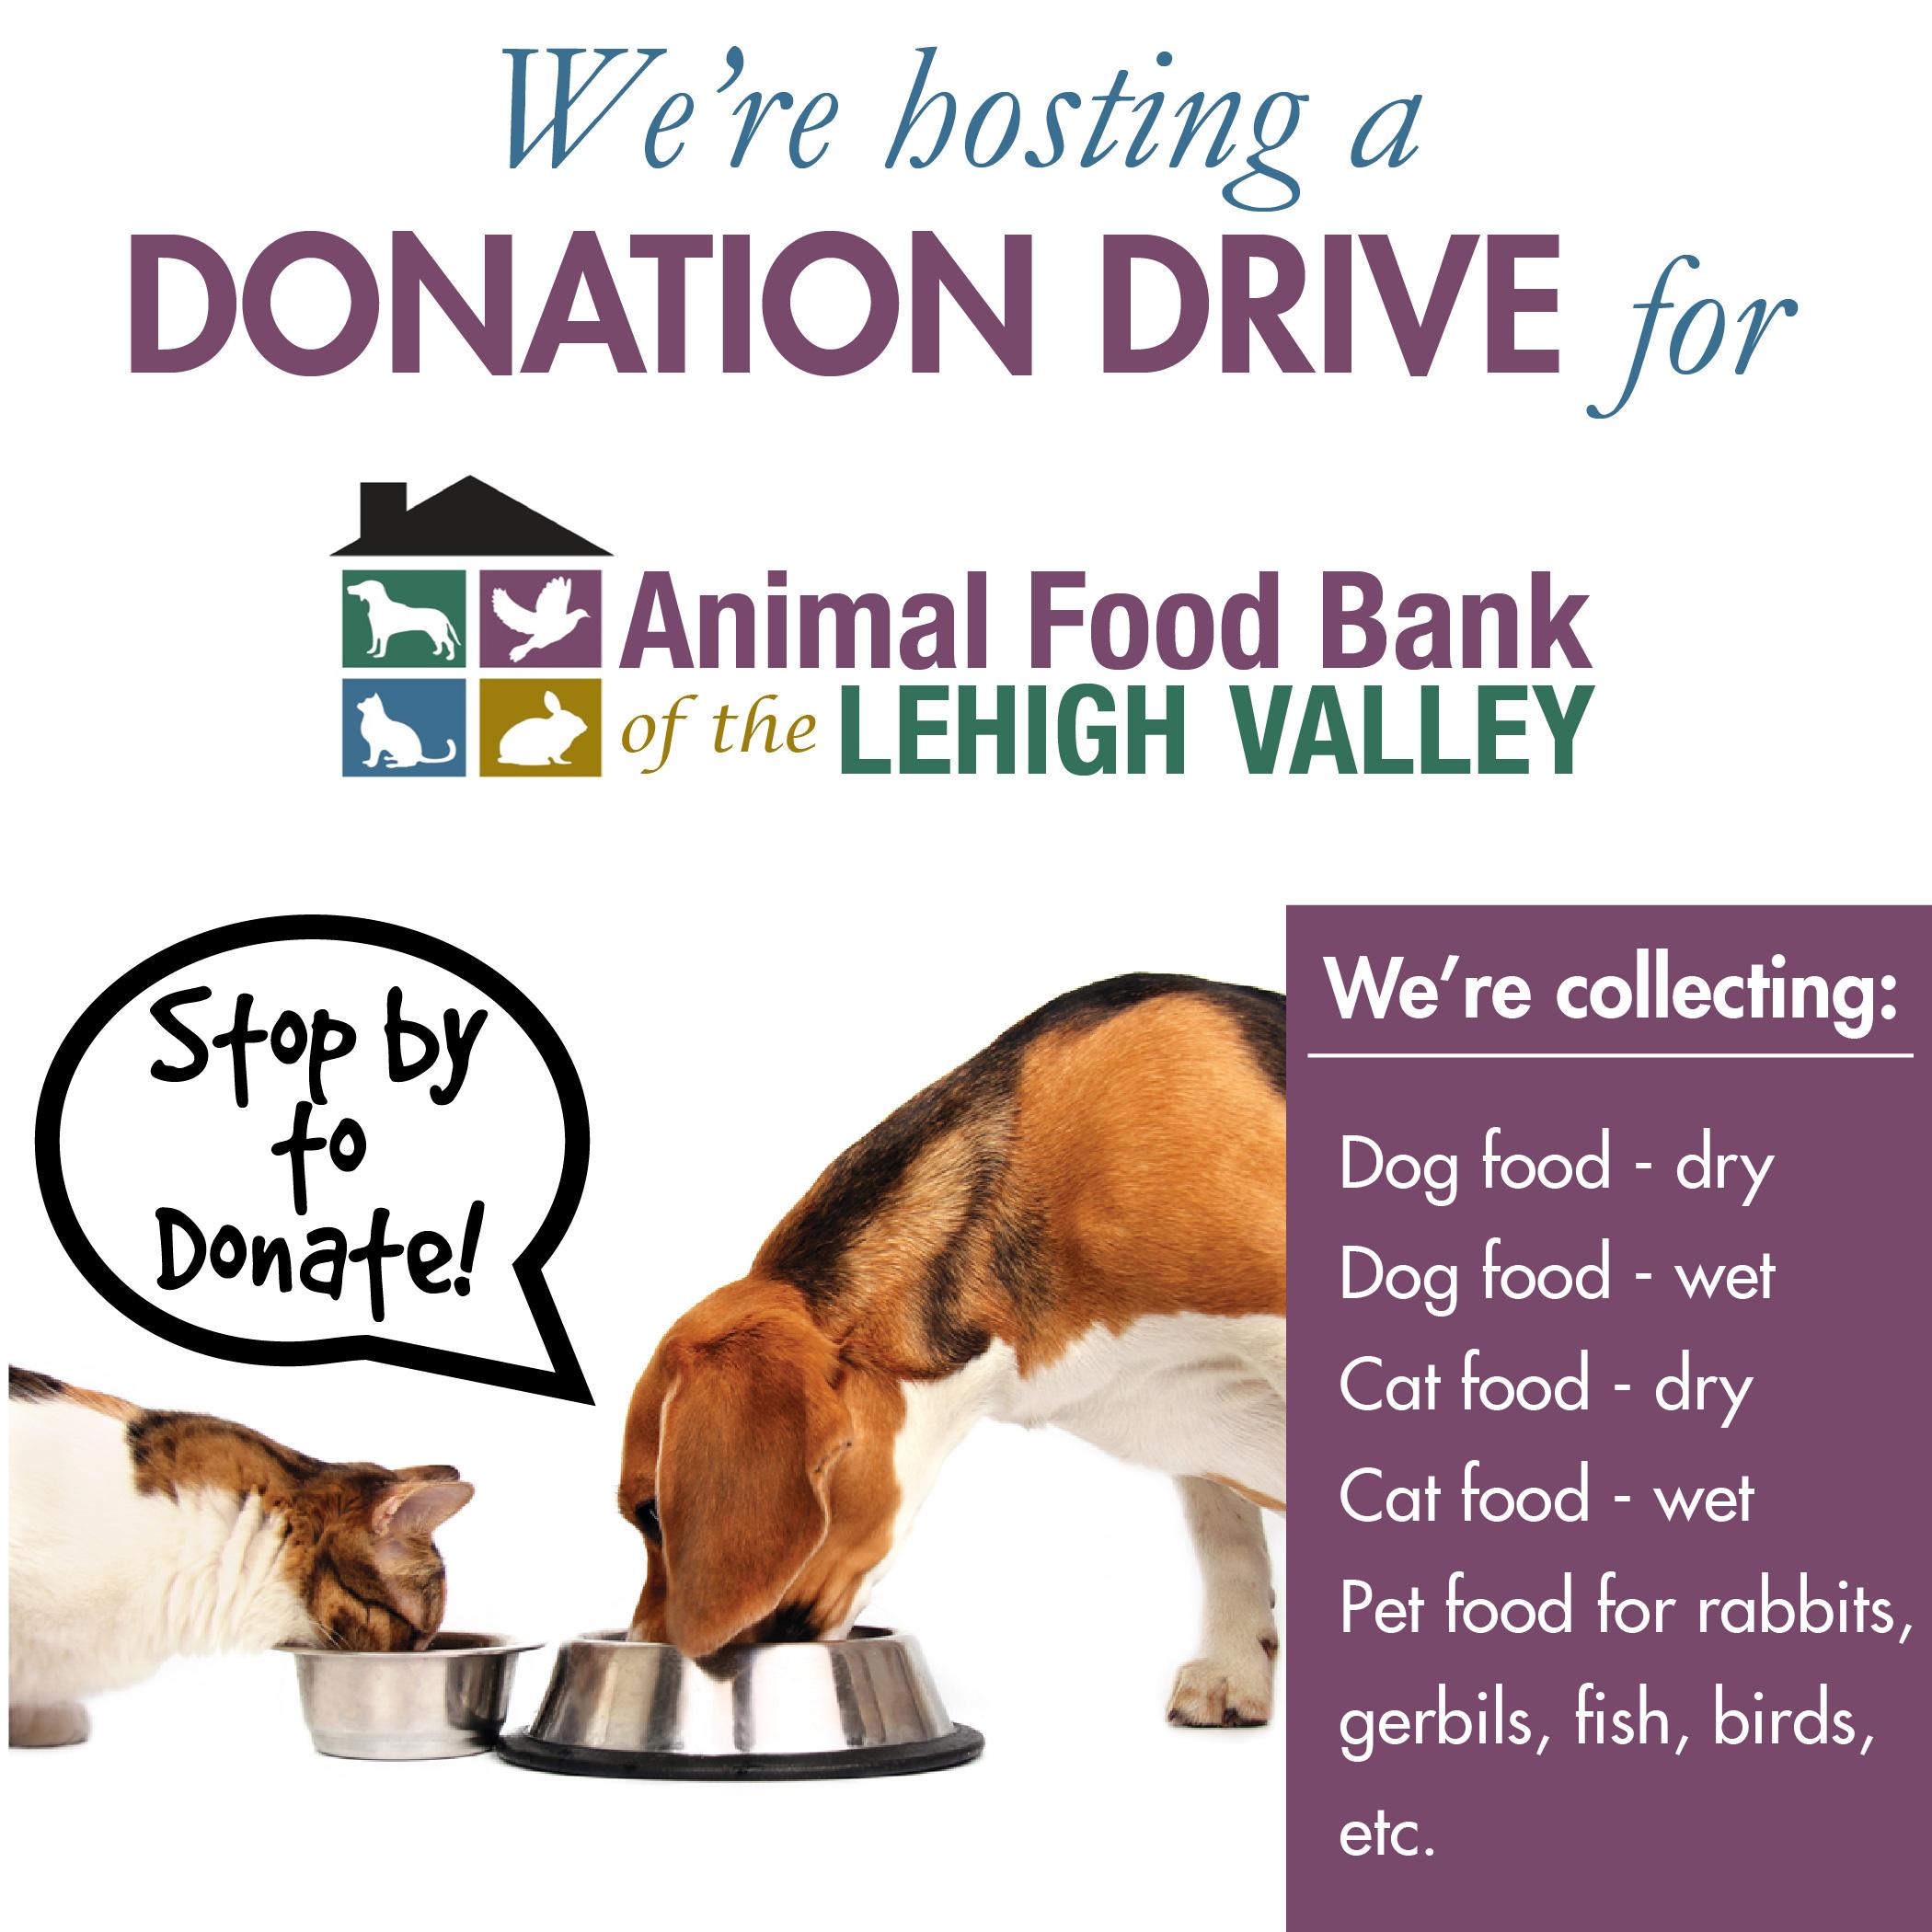 Donation Drive_Social Media Image.jpg